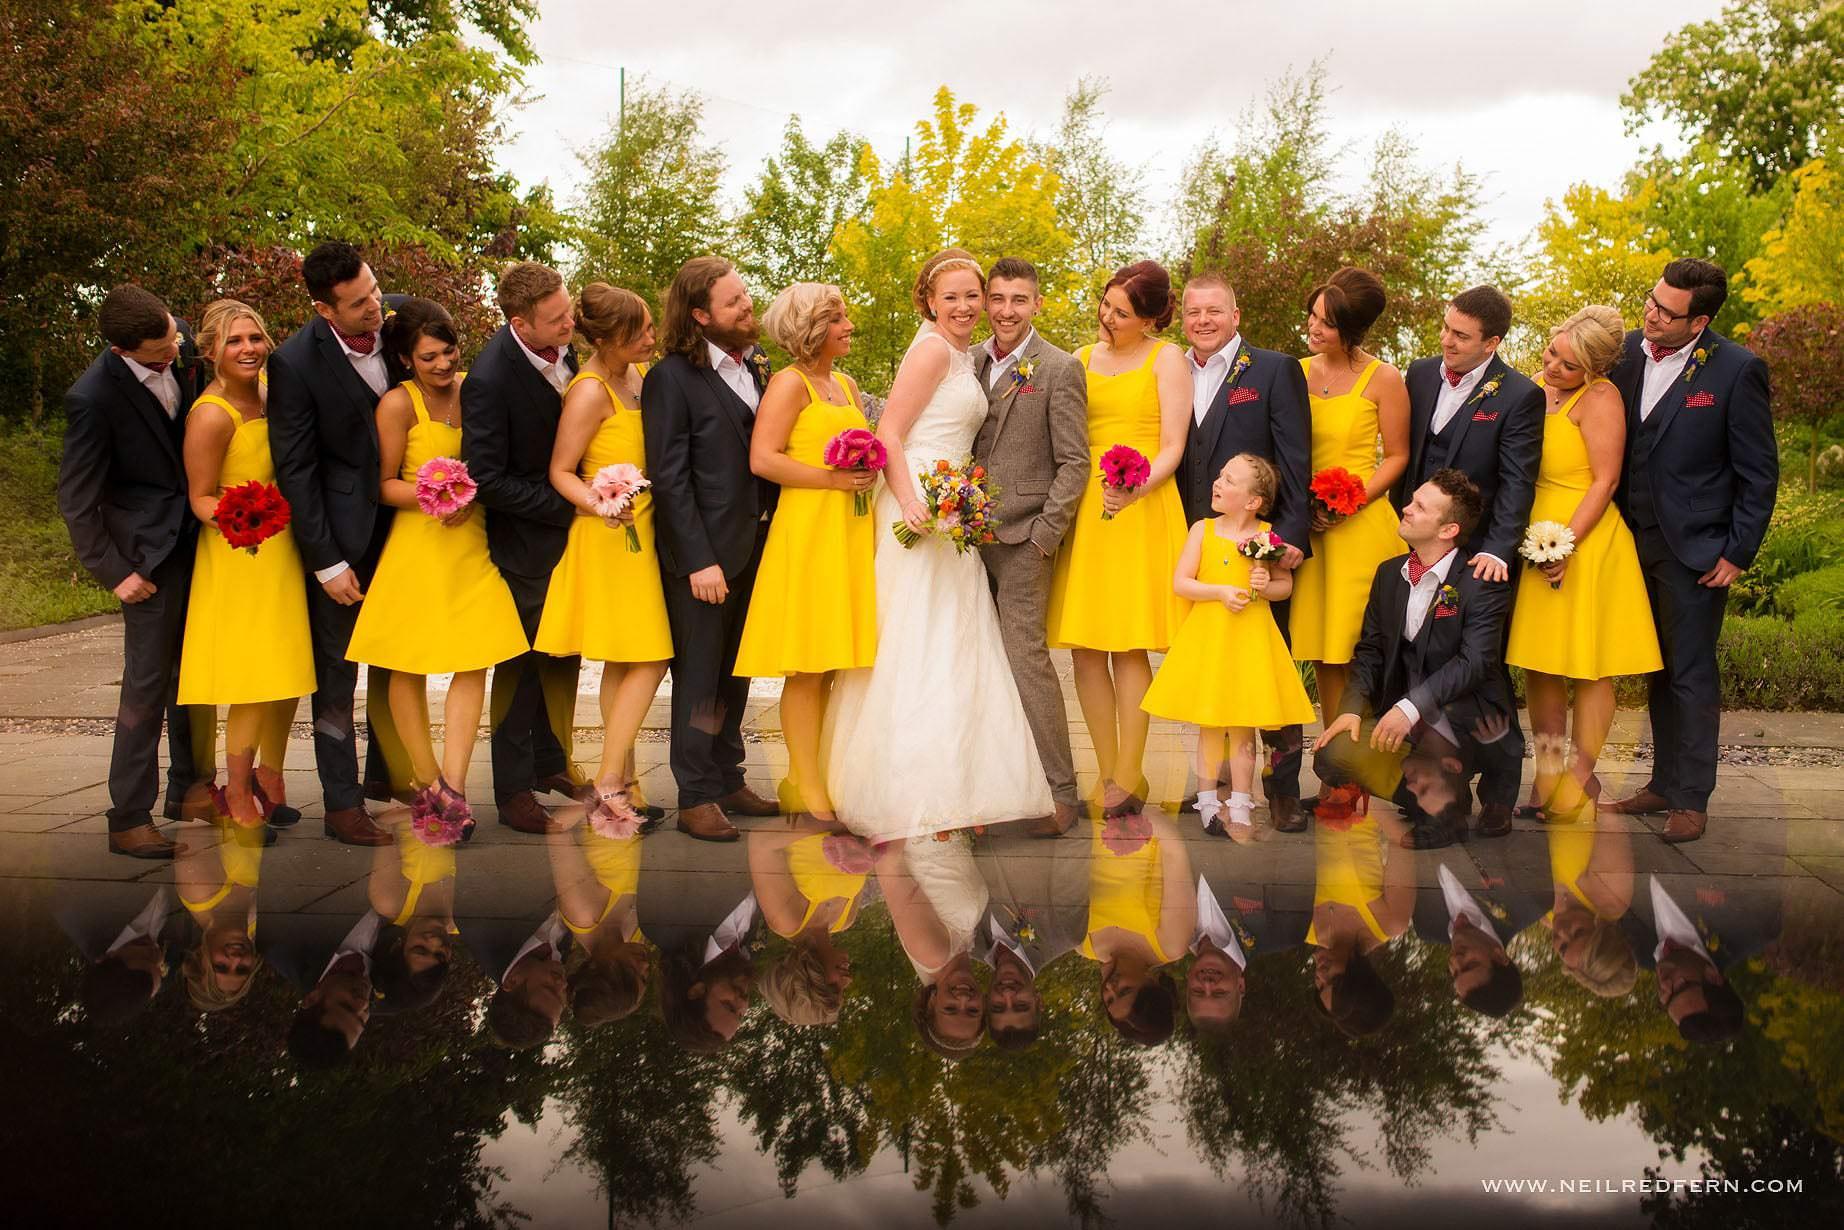 Bridal party group photograph